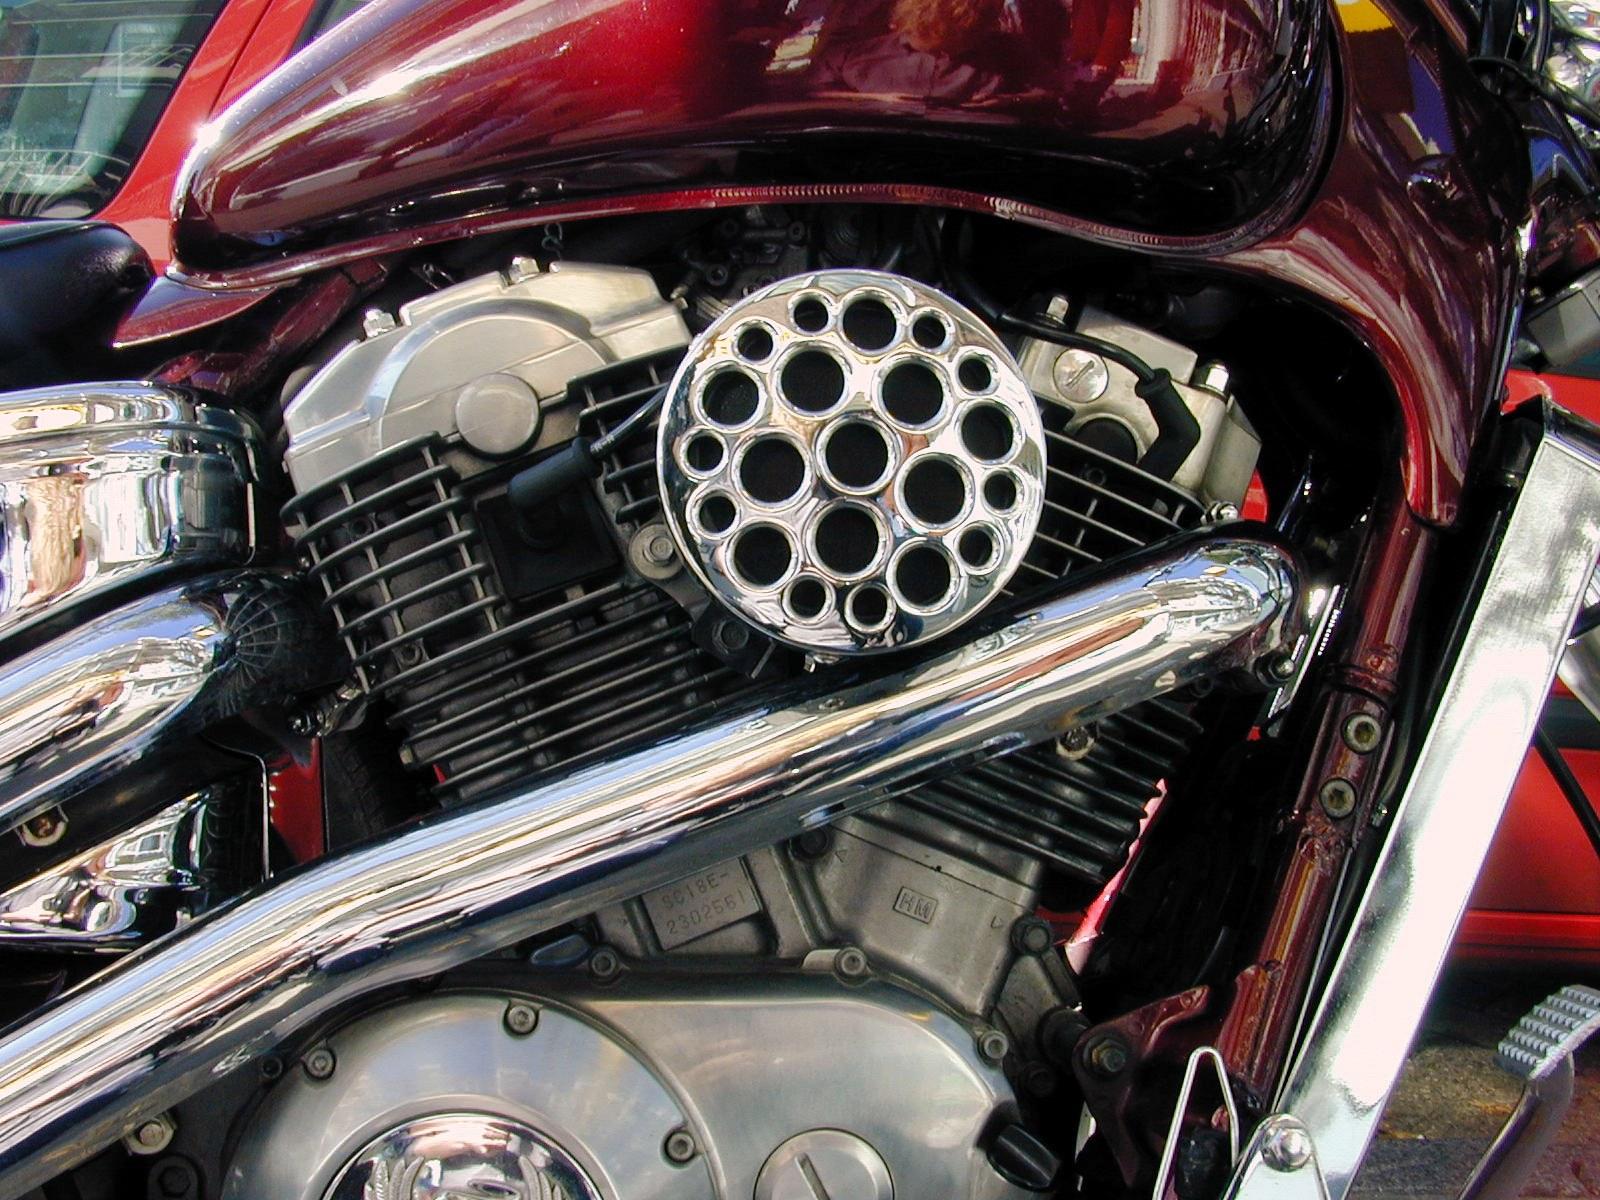 engine bike mechanic techno technic clean chrome images